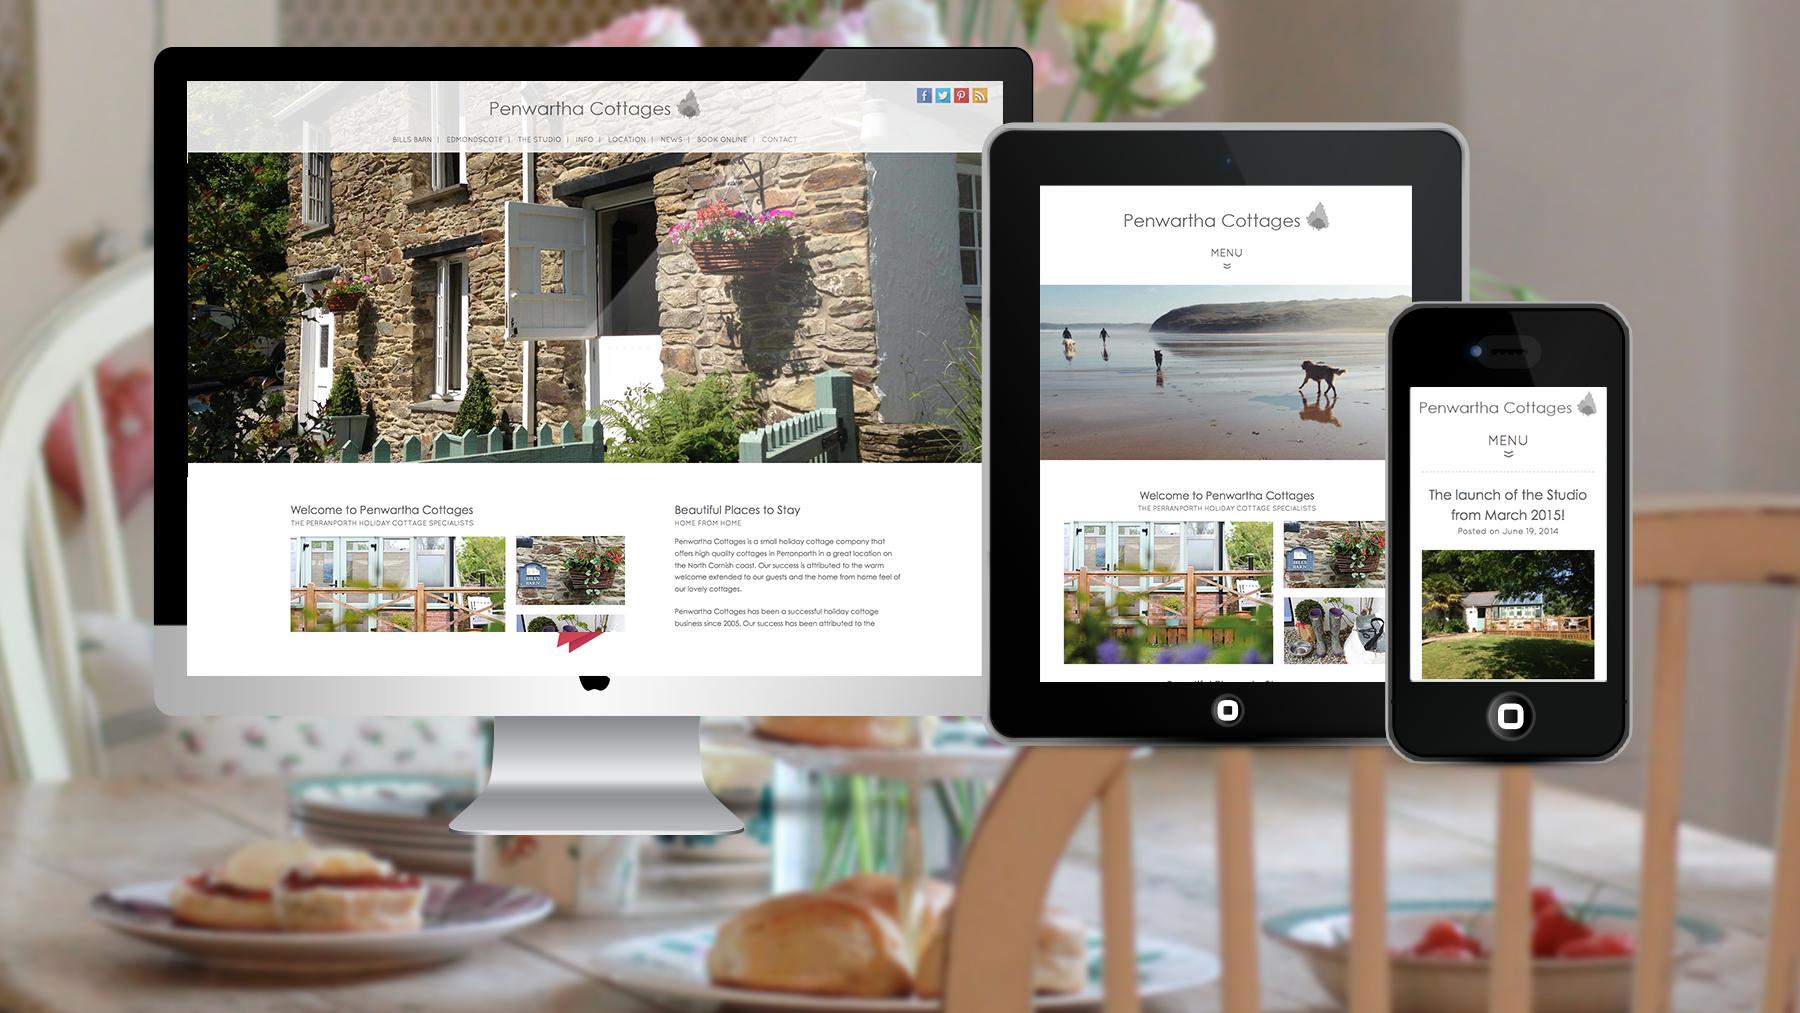 Penwartha Cottages on three screen sizes